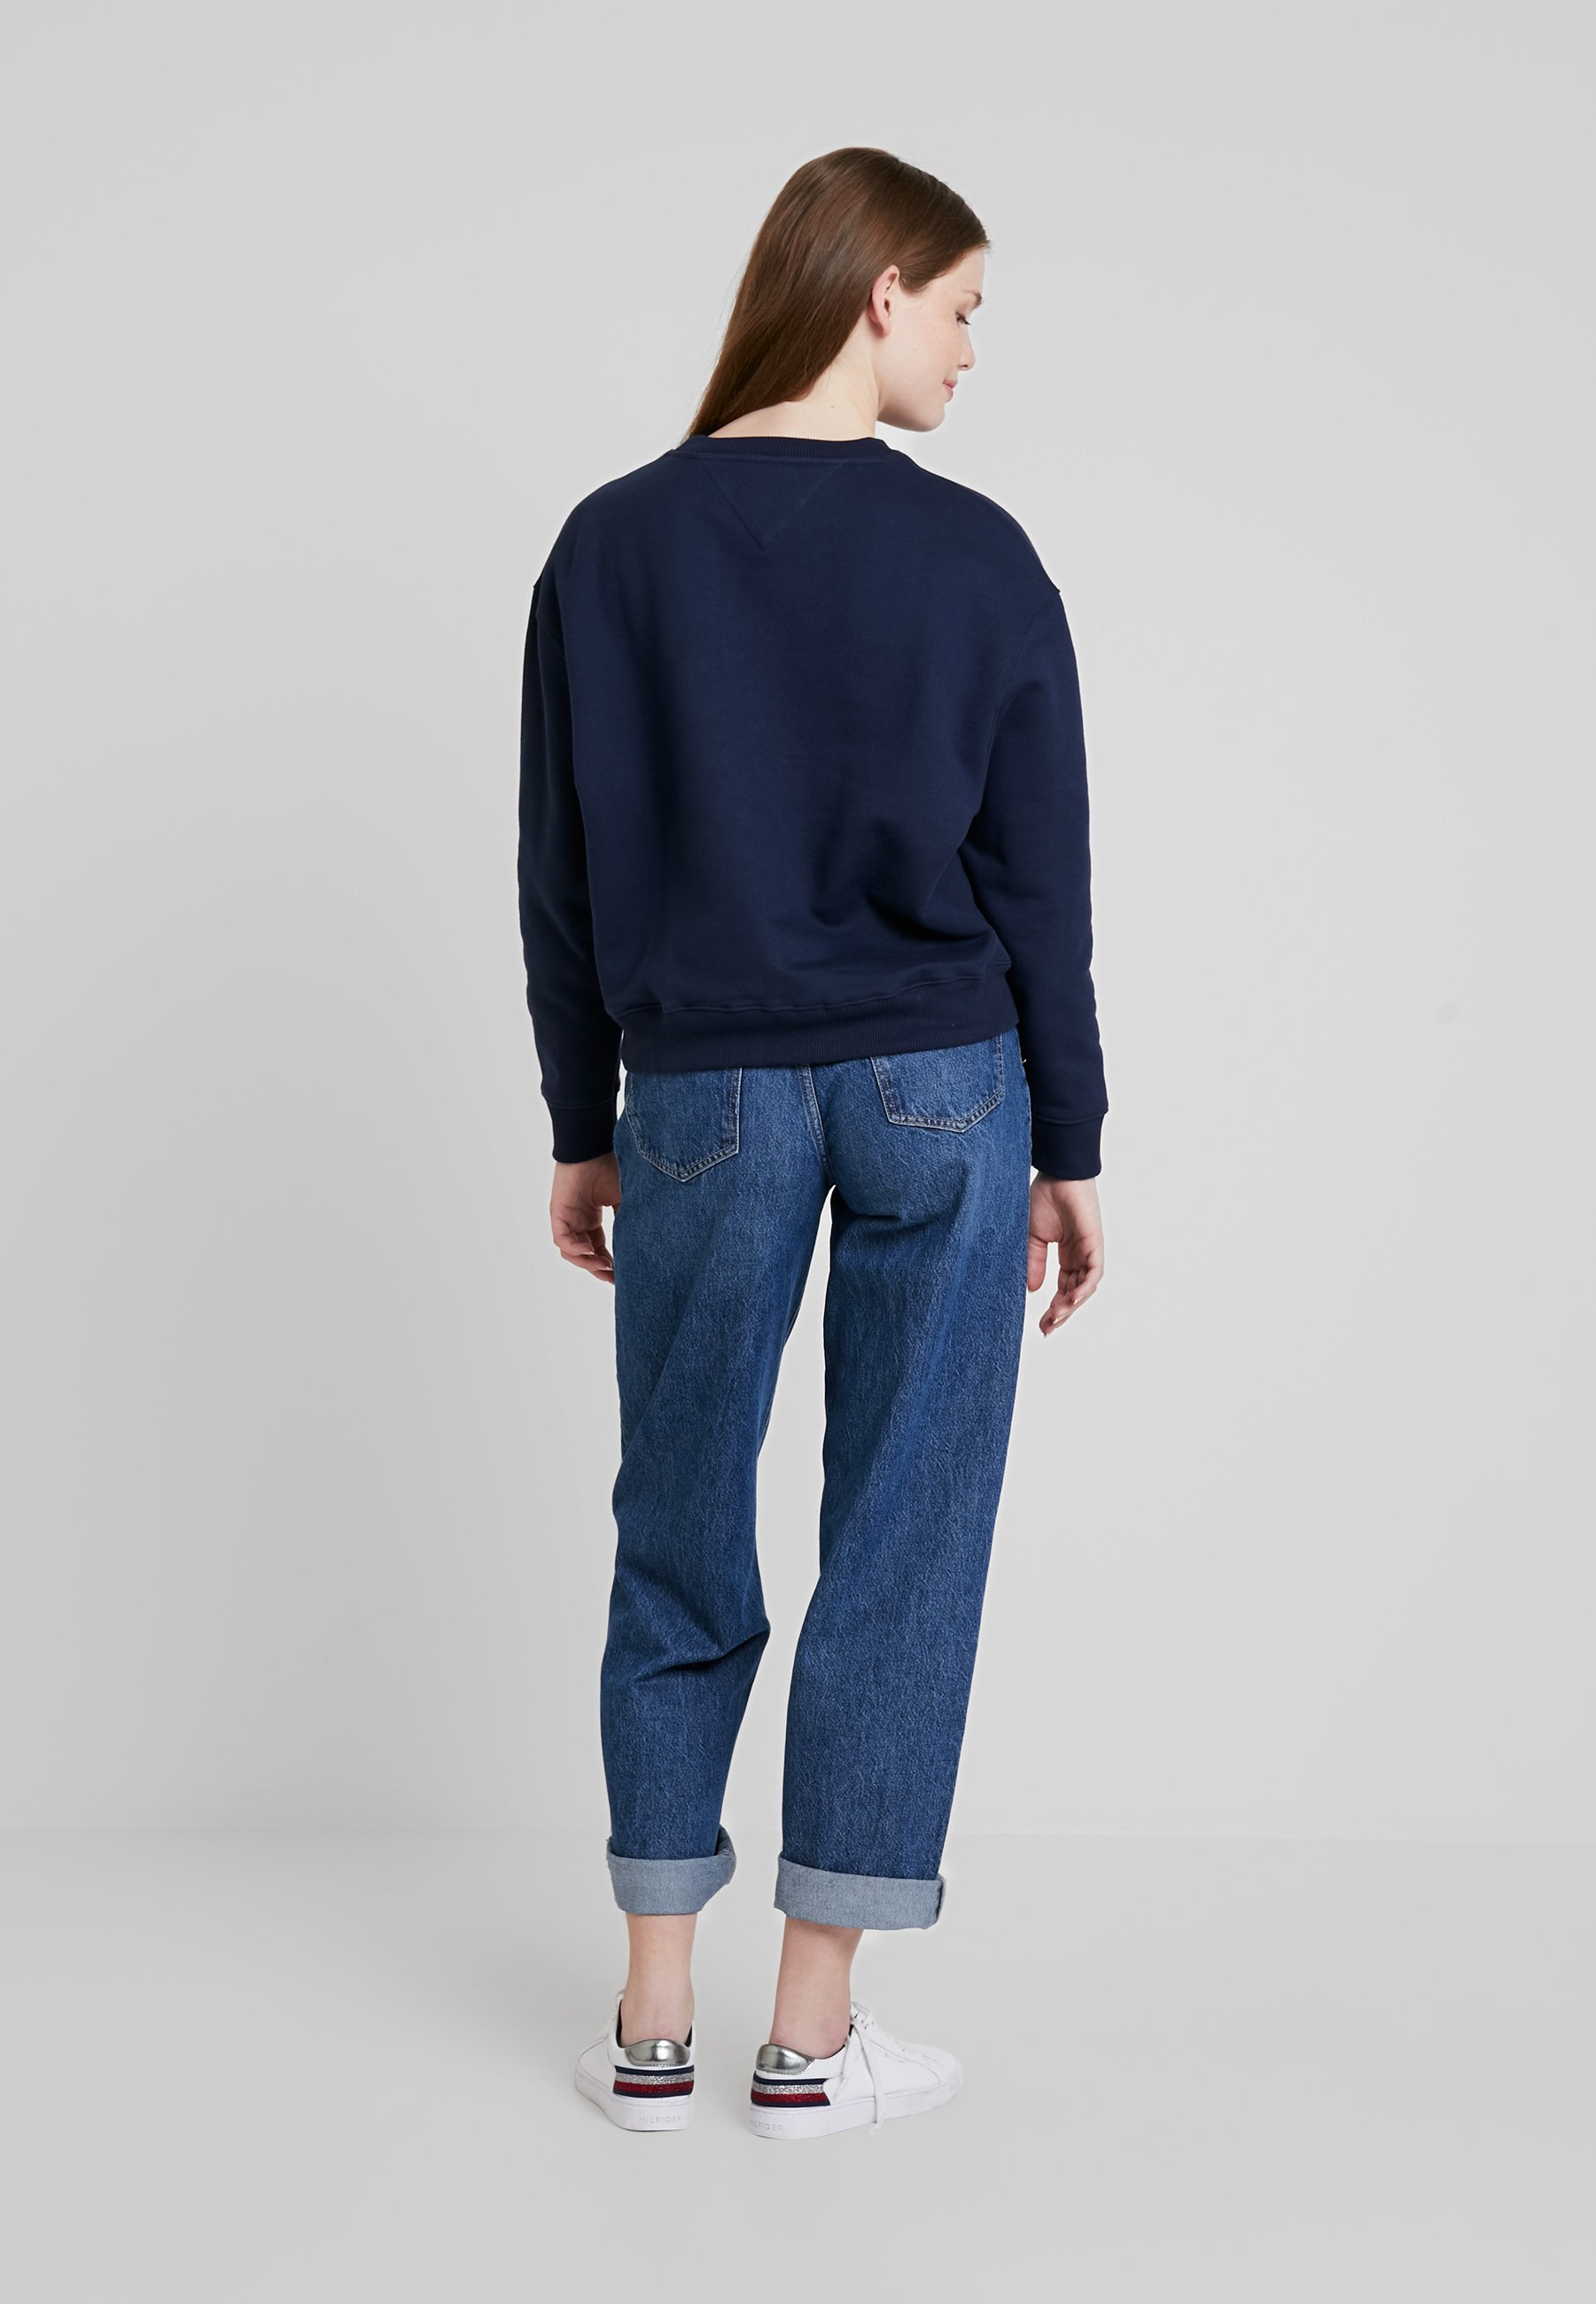 CrewSweatshirt Badge Black Jeans Iris Tommy nP0wkO